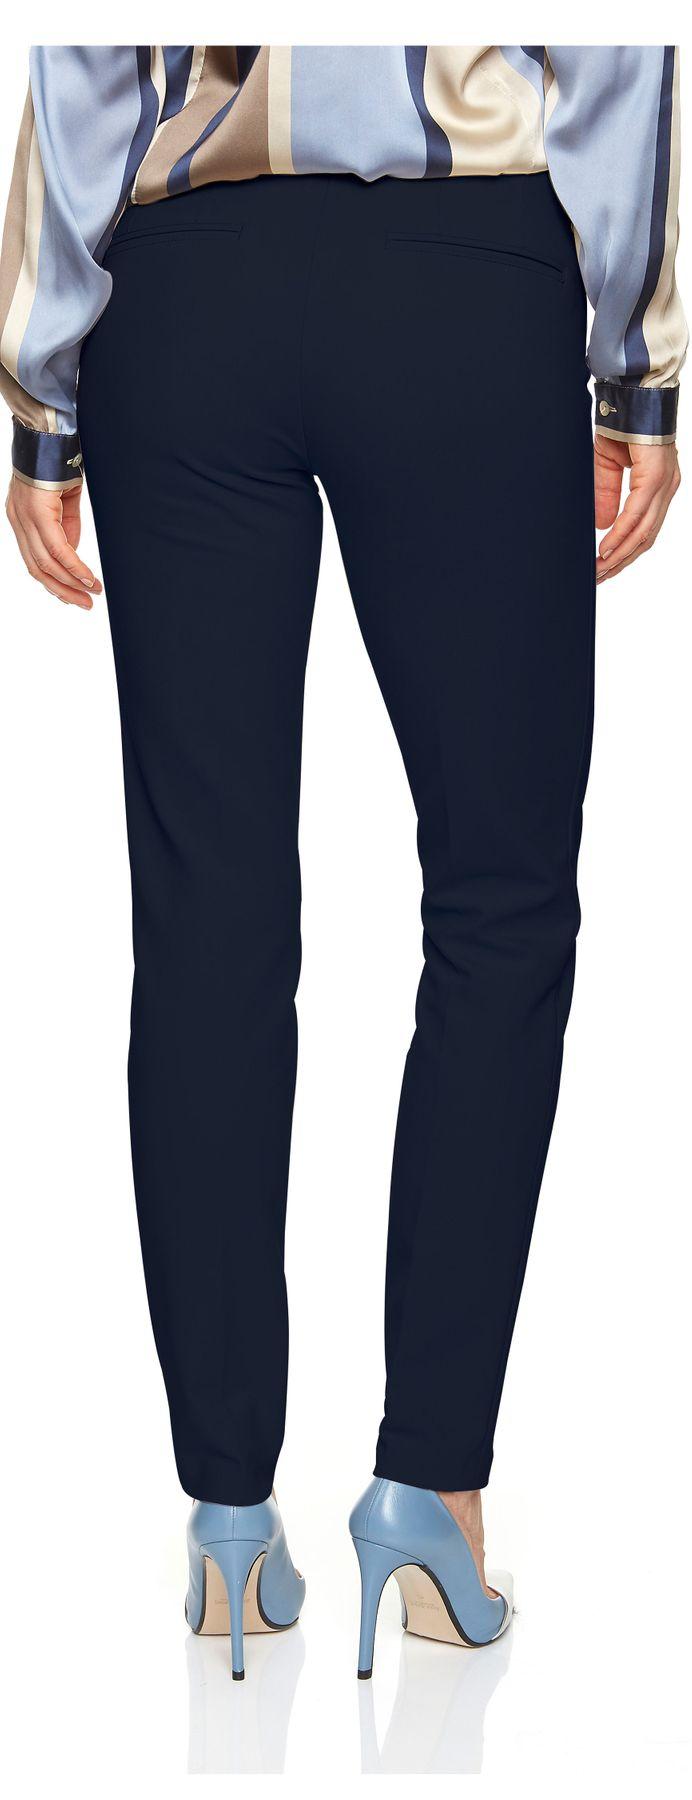 Atelier Gardeur - Slim Fit - Damen Cityhose, Zigarette in dunkelblau, Zene1 (600261) – Bild 4